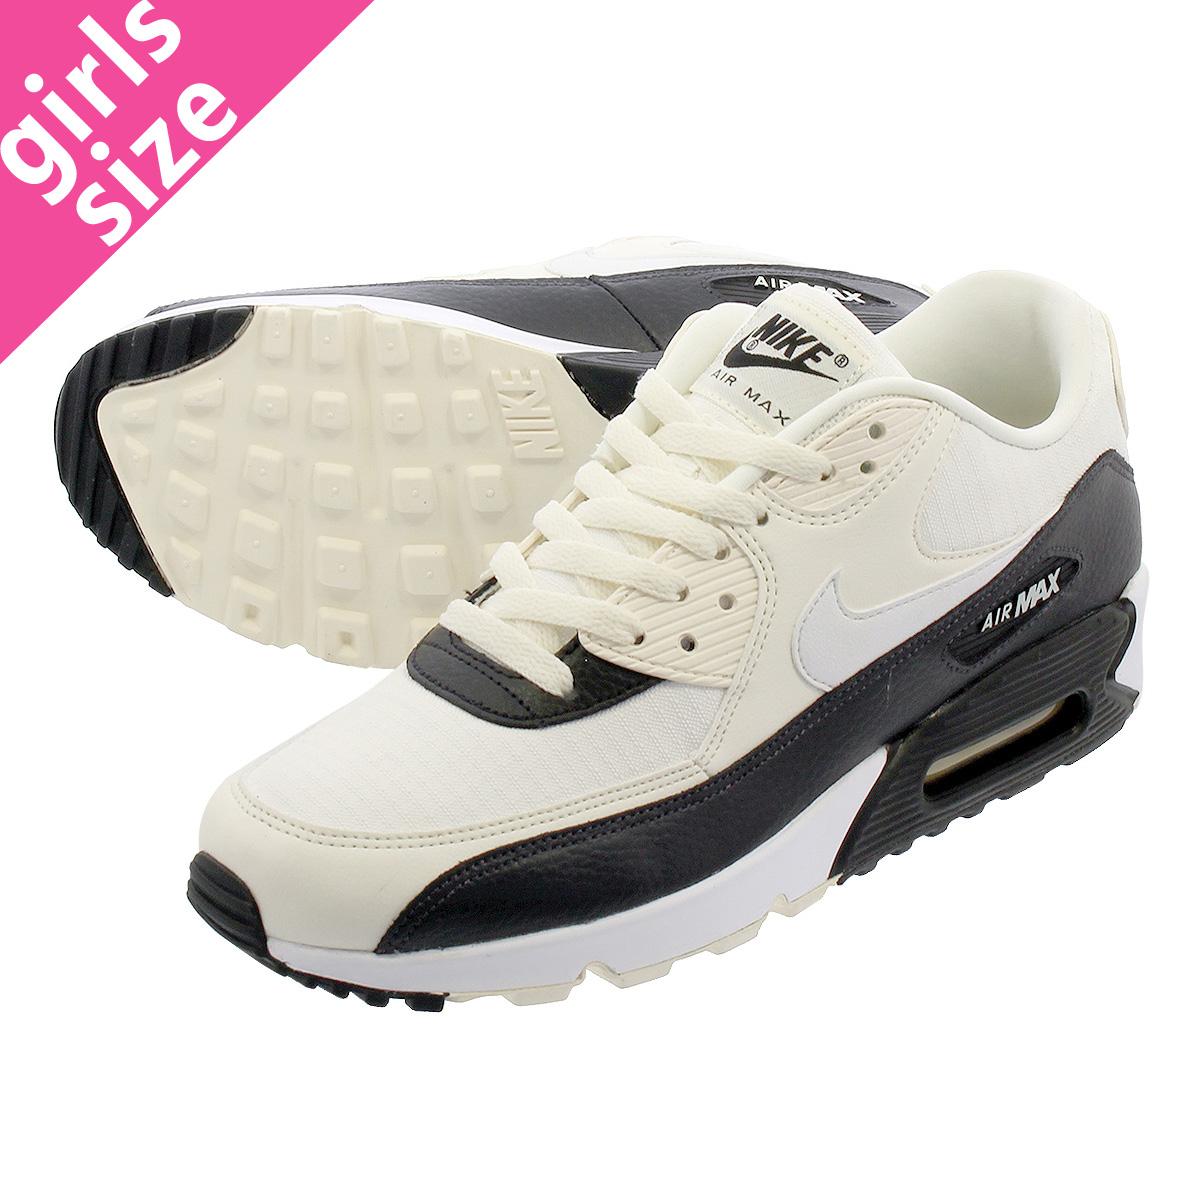 NIKE WMNS AIR MAX 90 Nike women Air Max 90 PALE IVORYSUMMIT WHITEBLACKOIL GREY 325,213 138